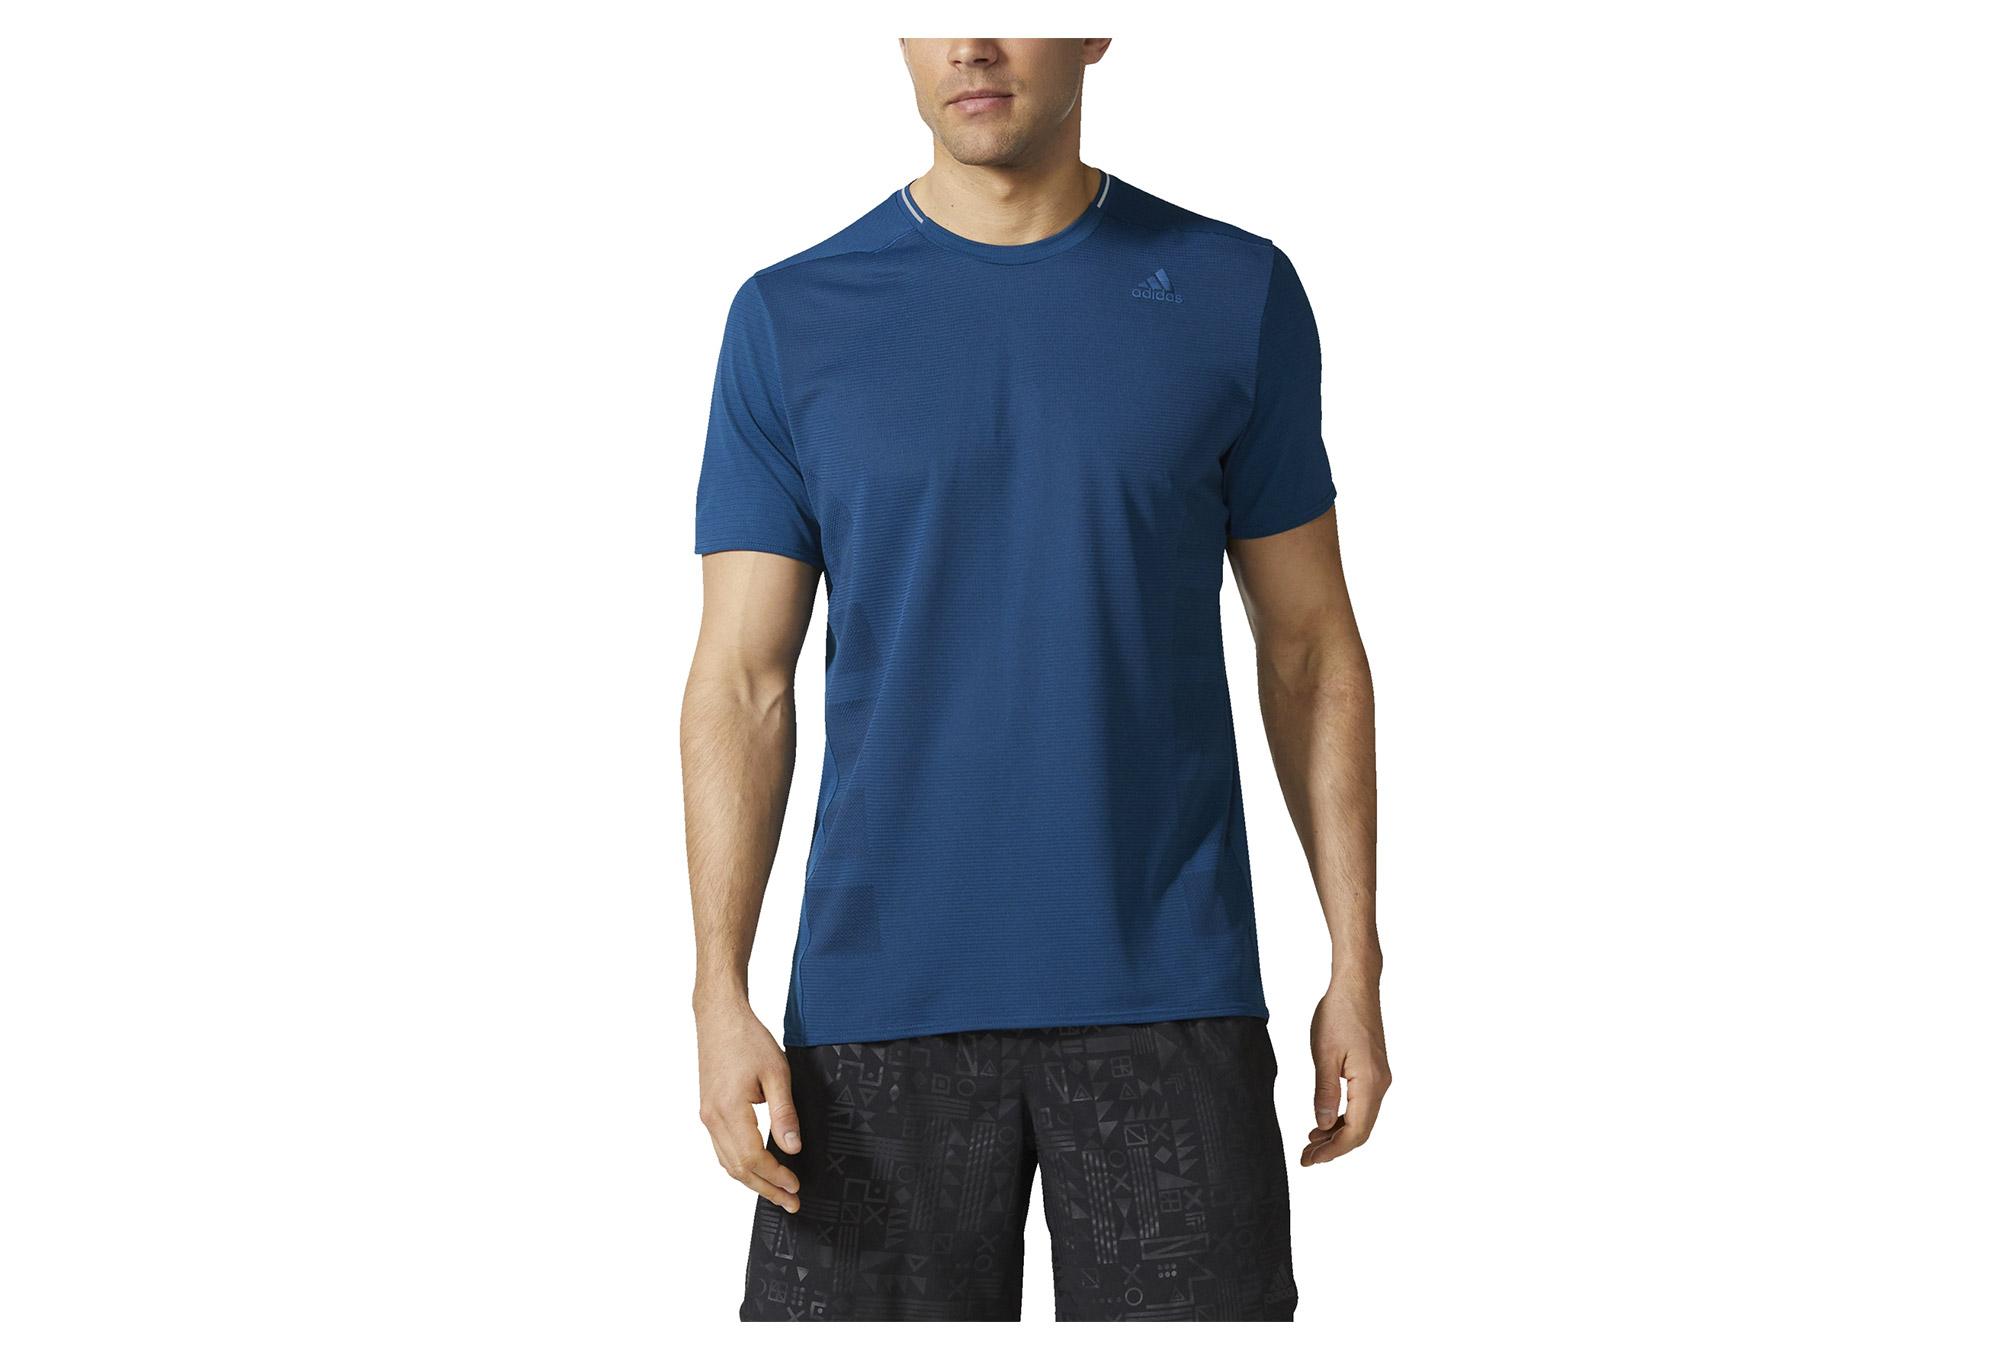 d5d64ccd1 adidas running Supernova Short Sleeves Jersey Blue Night